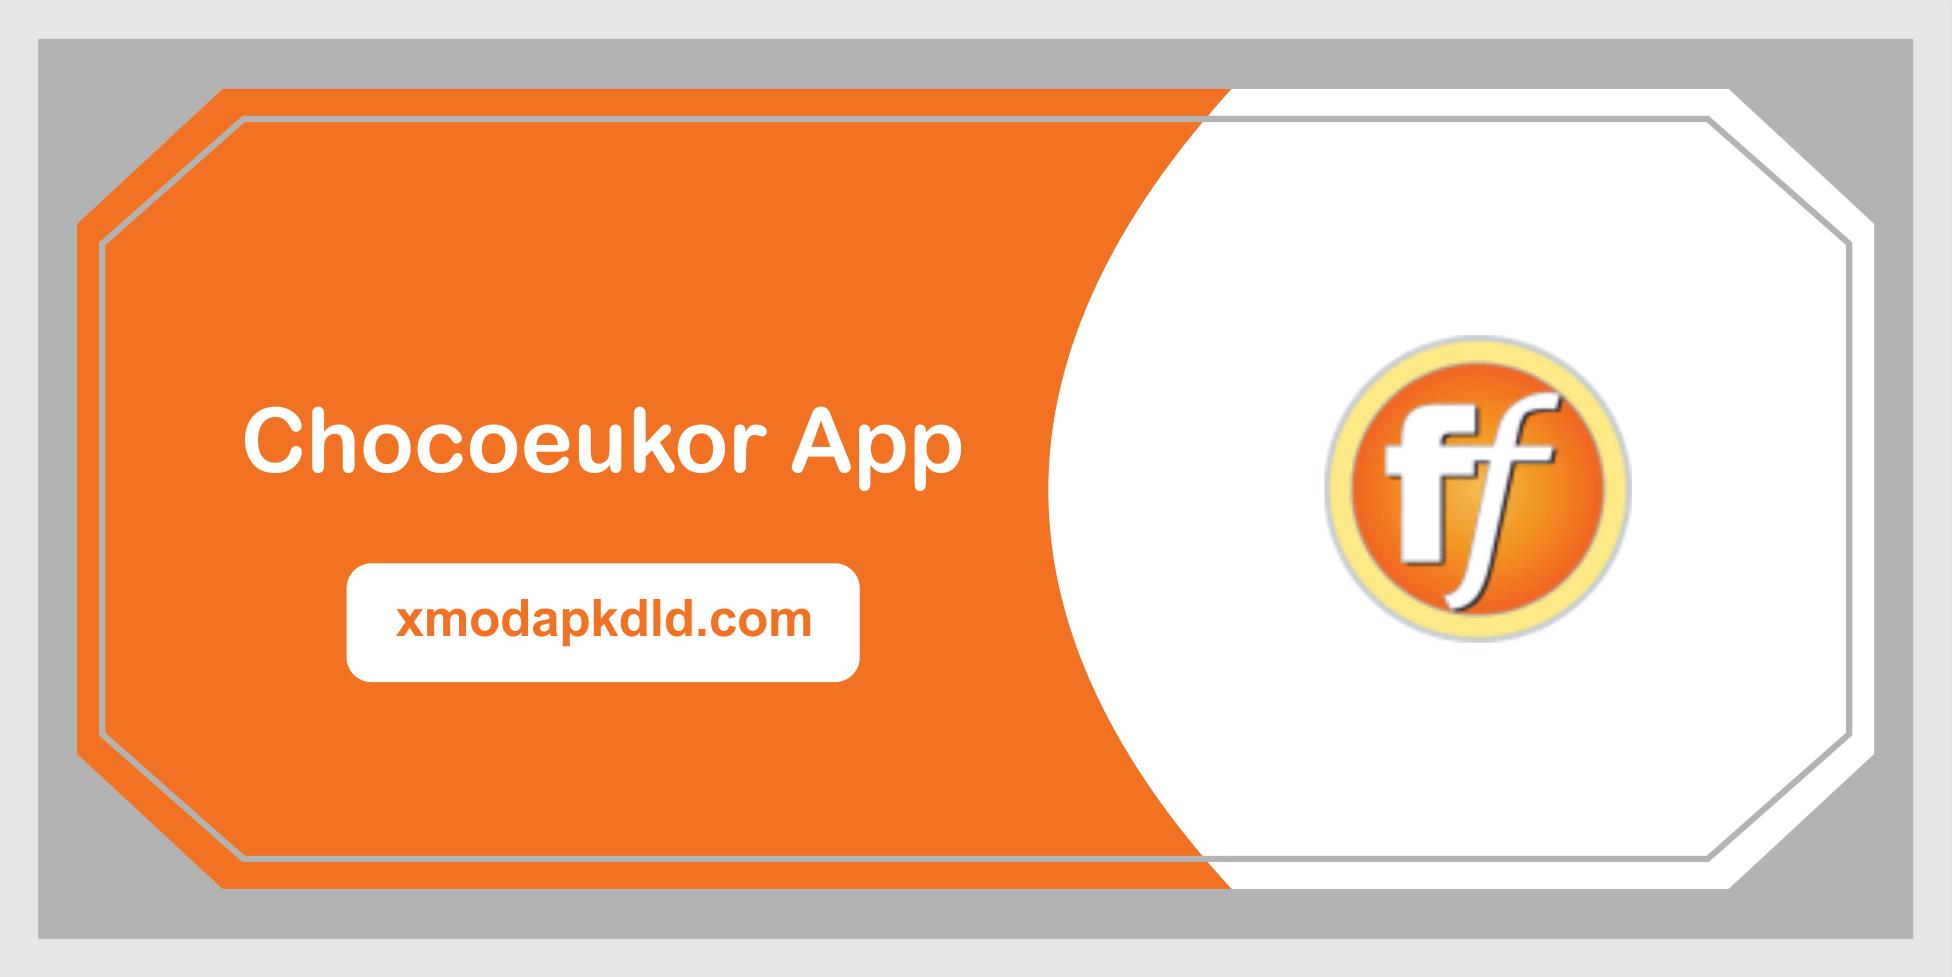 chocoeukor app